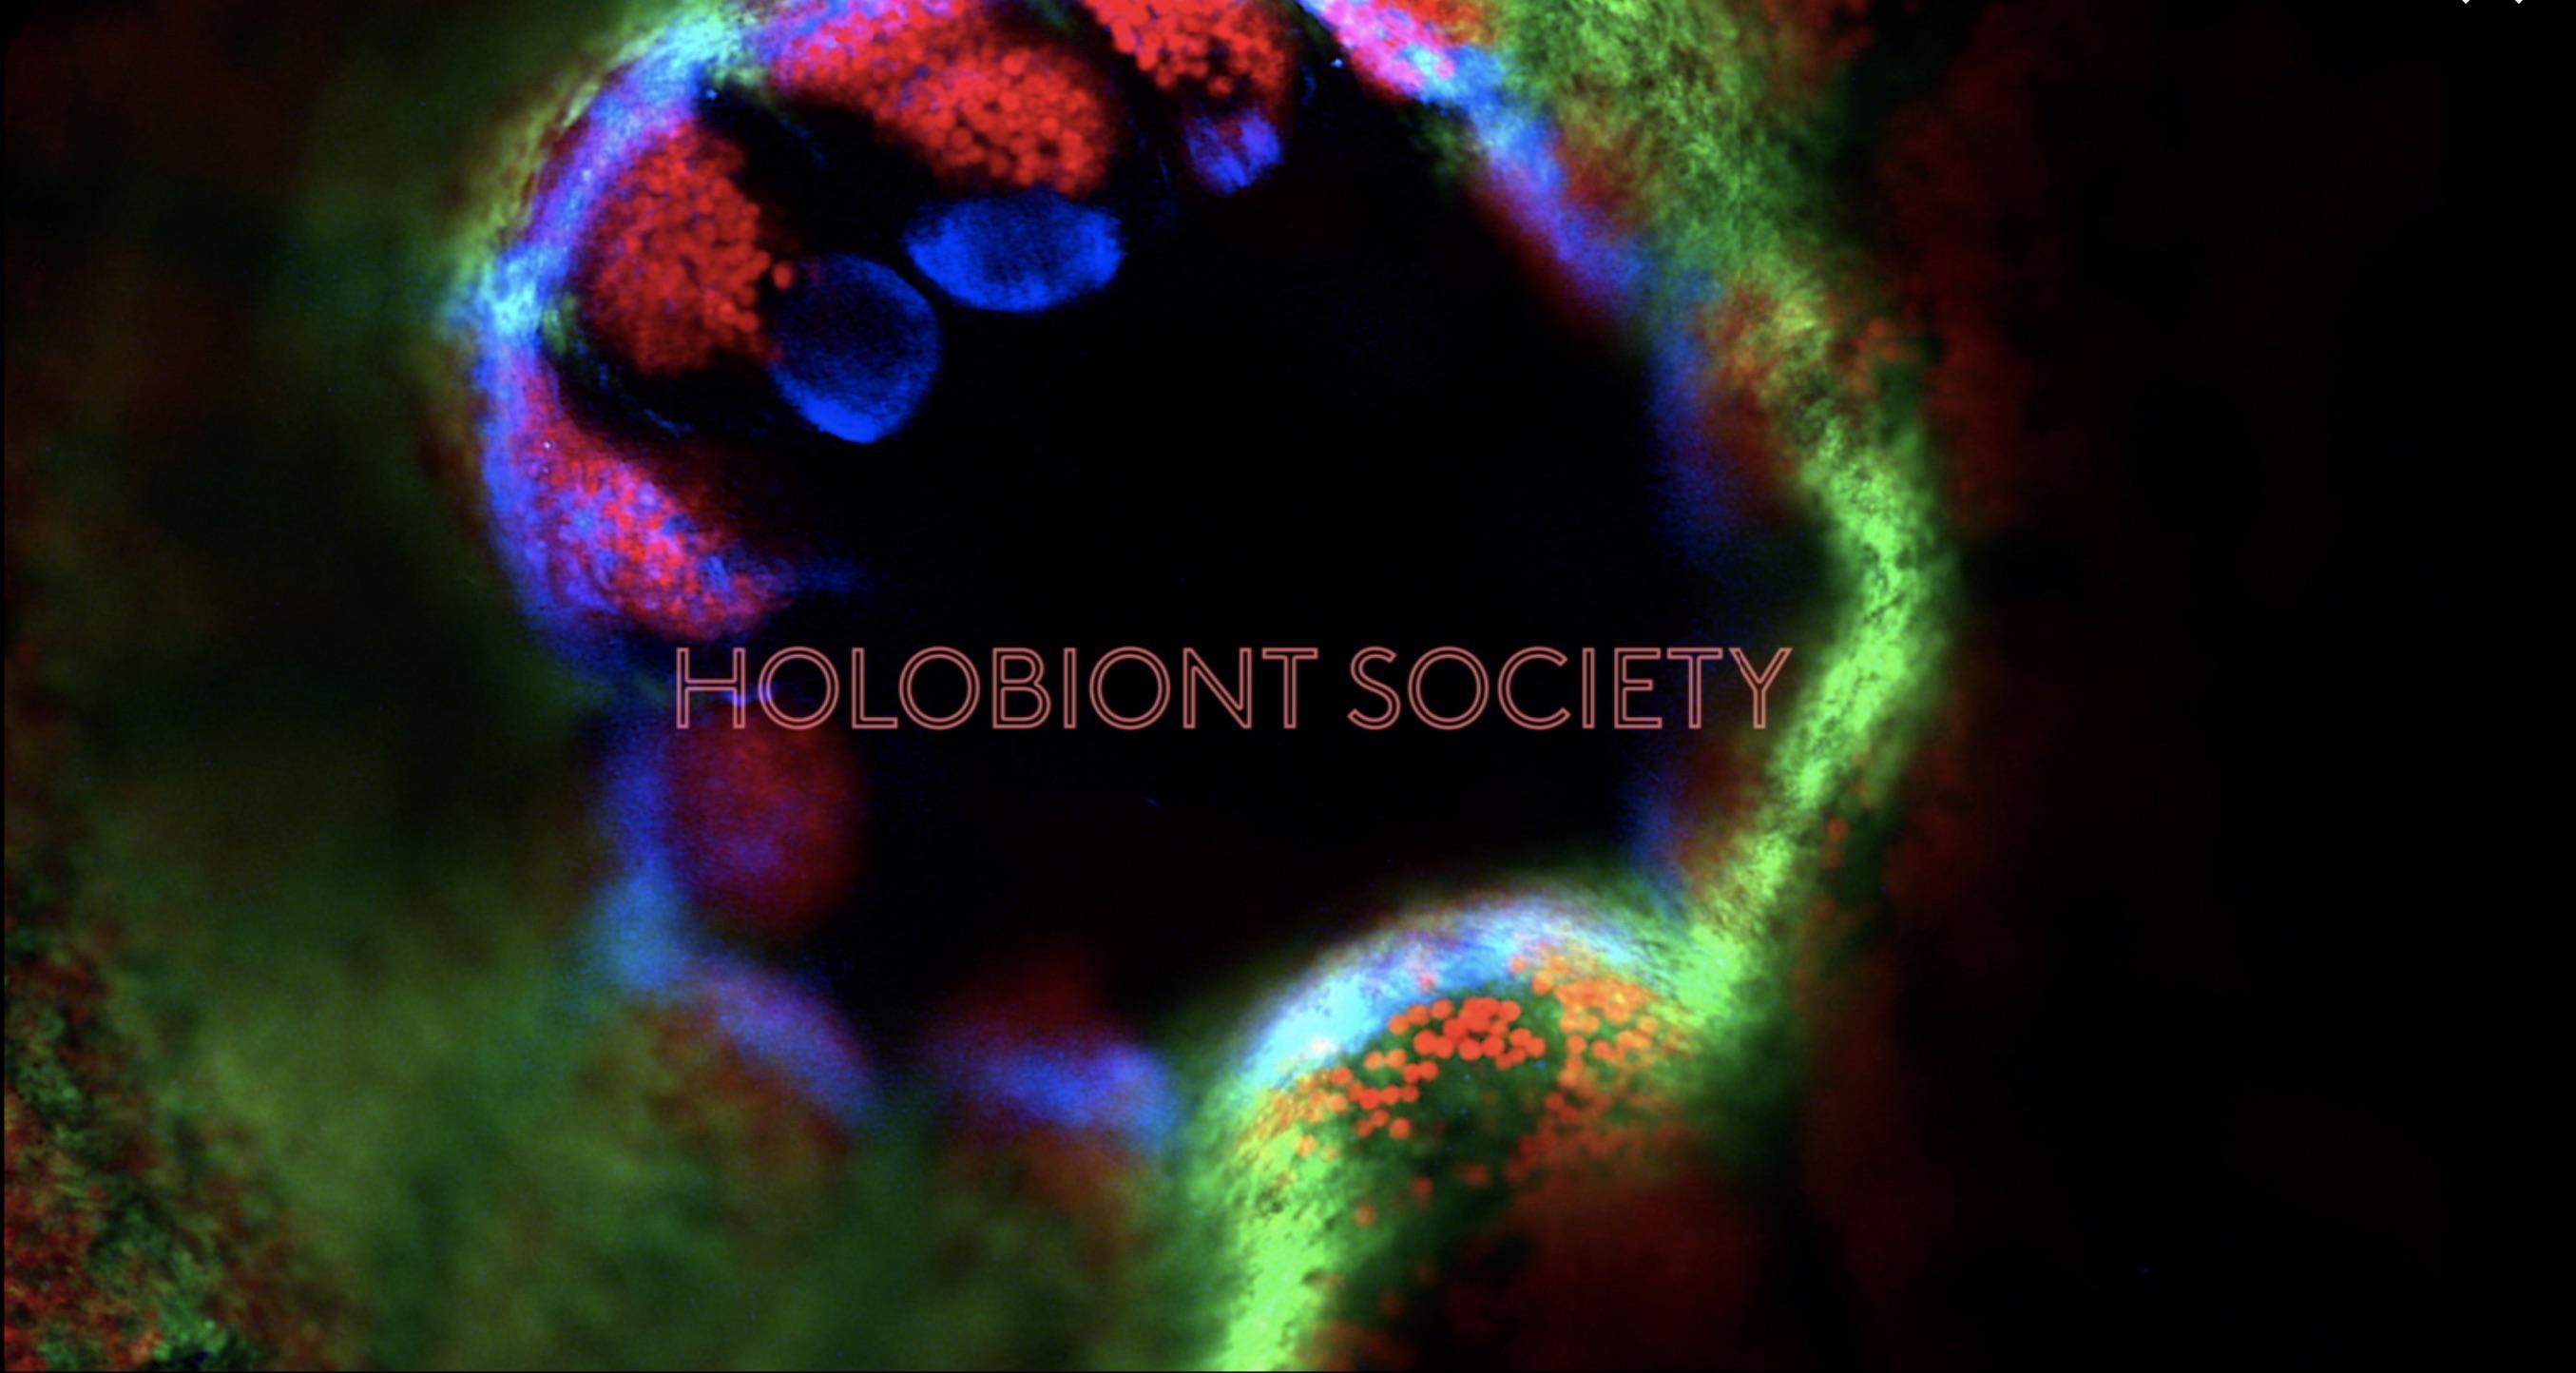 Holobiont Society